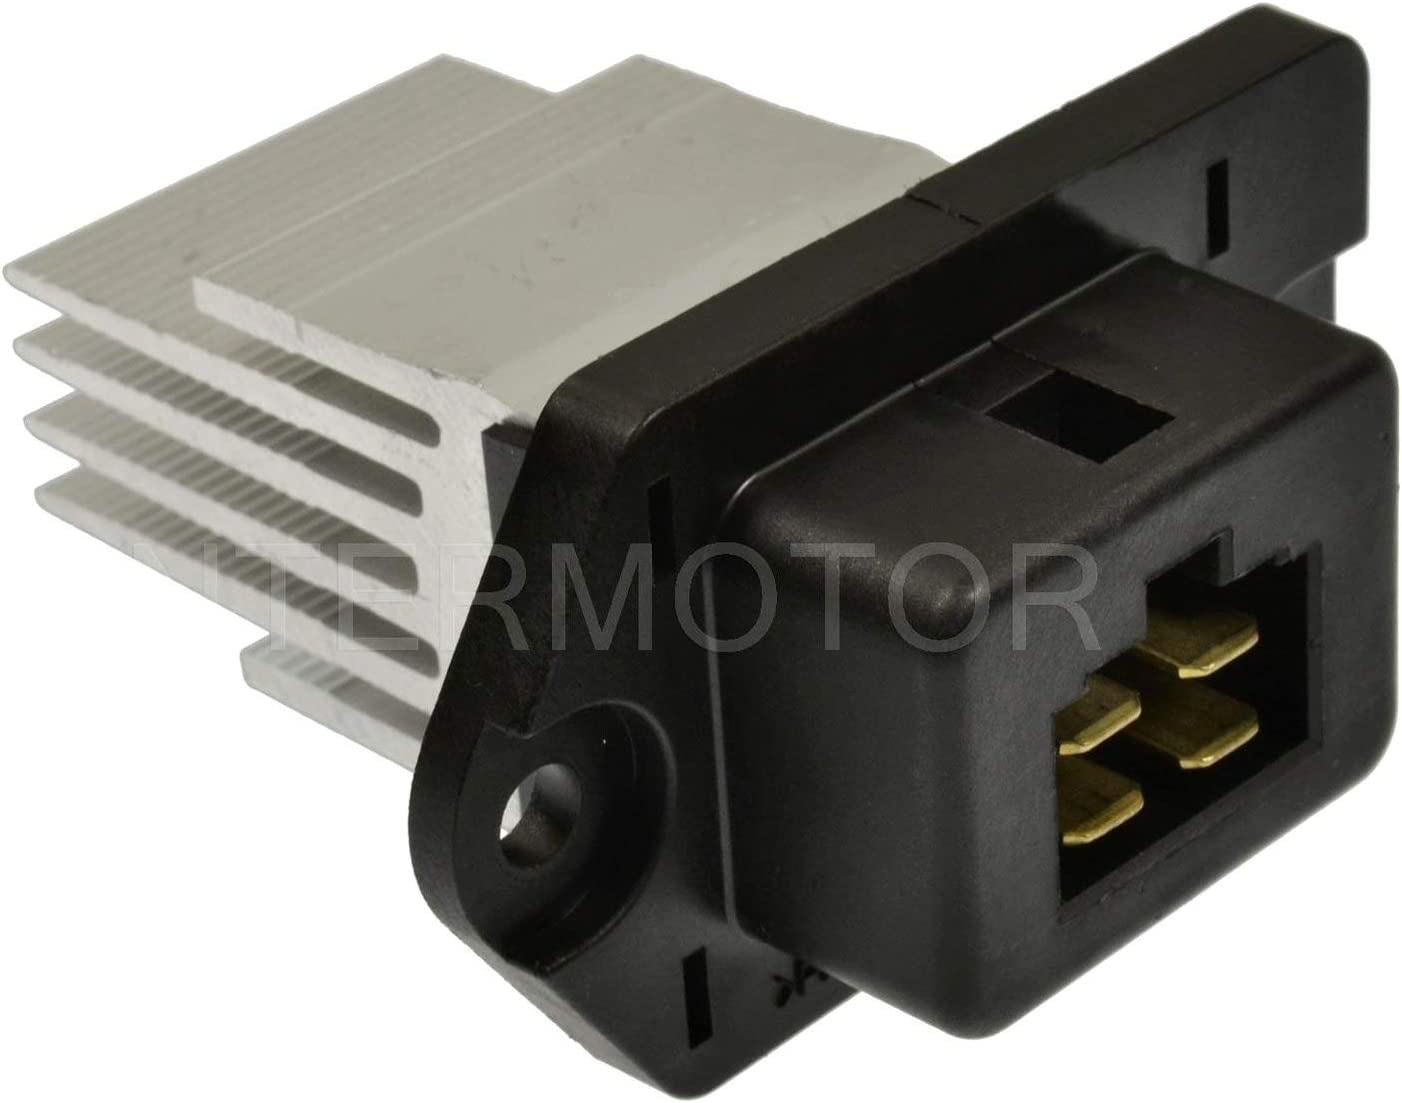 Super popular specialty store Standard Motor Very popular Products RU945 Resistor Blower